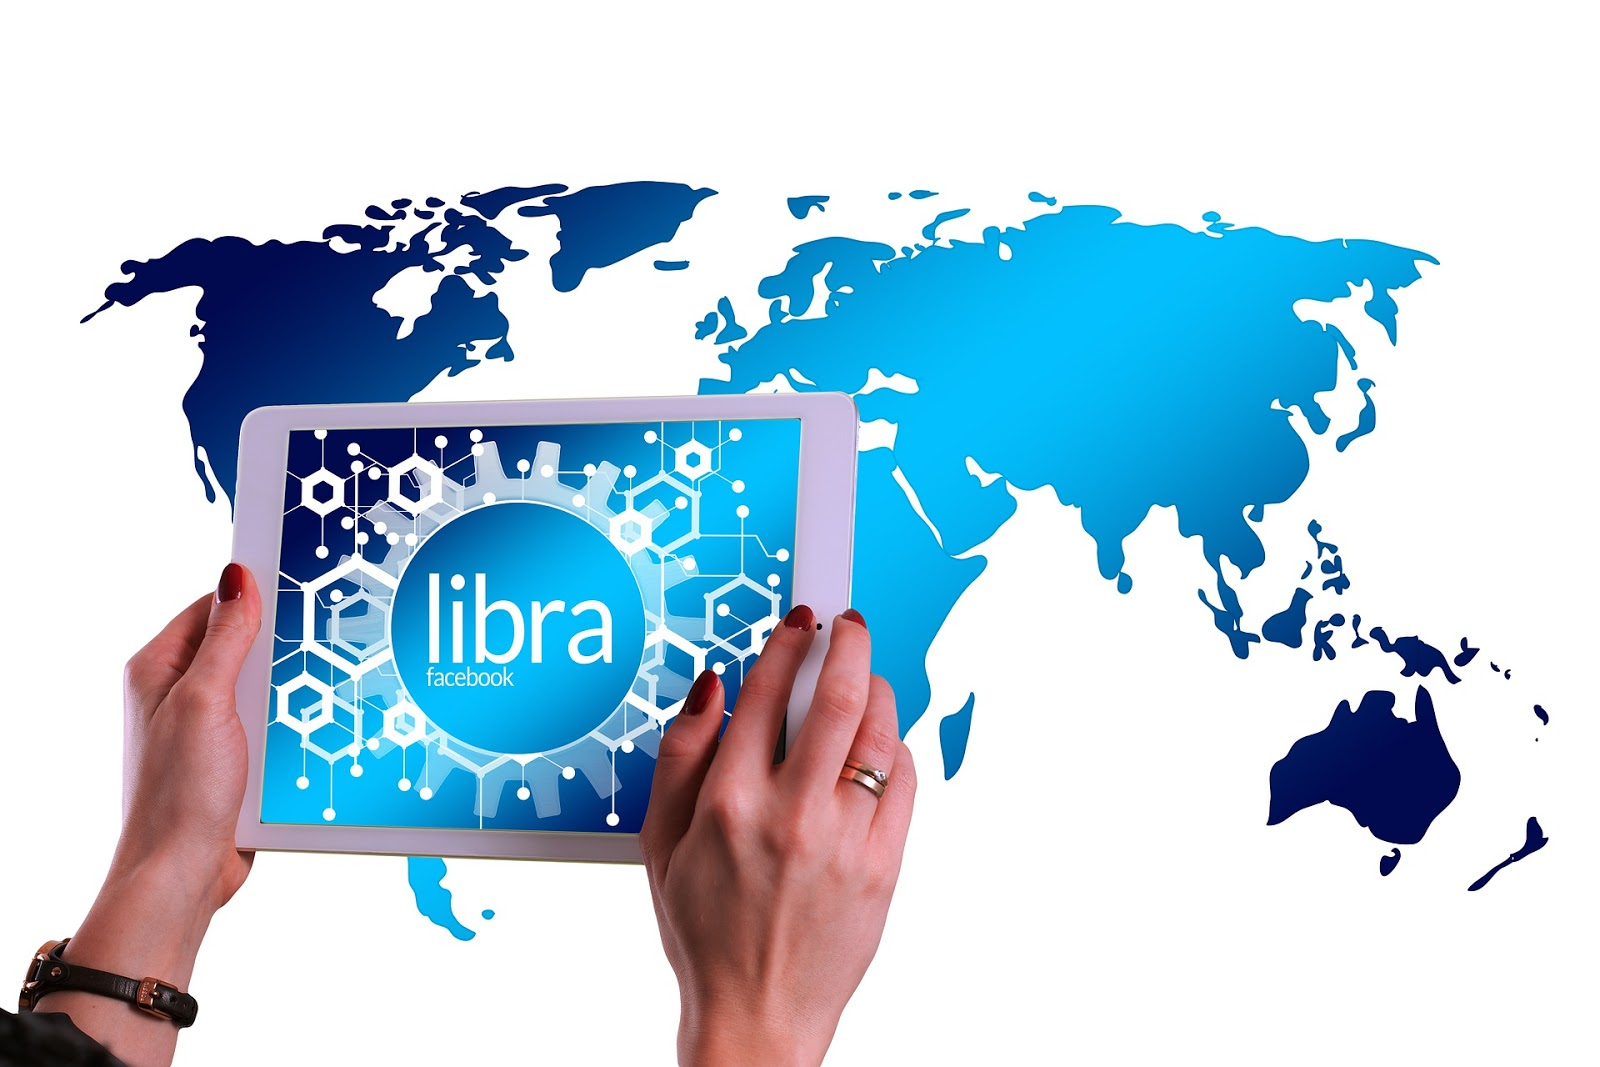 Libra Horoscope or Facebook Digital Currency Wallet - techmekraj